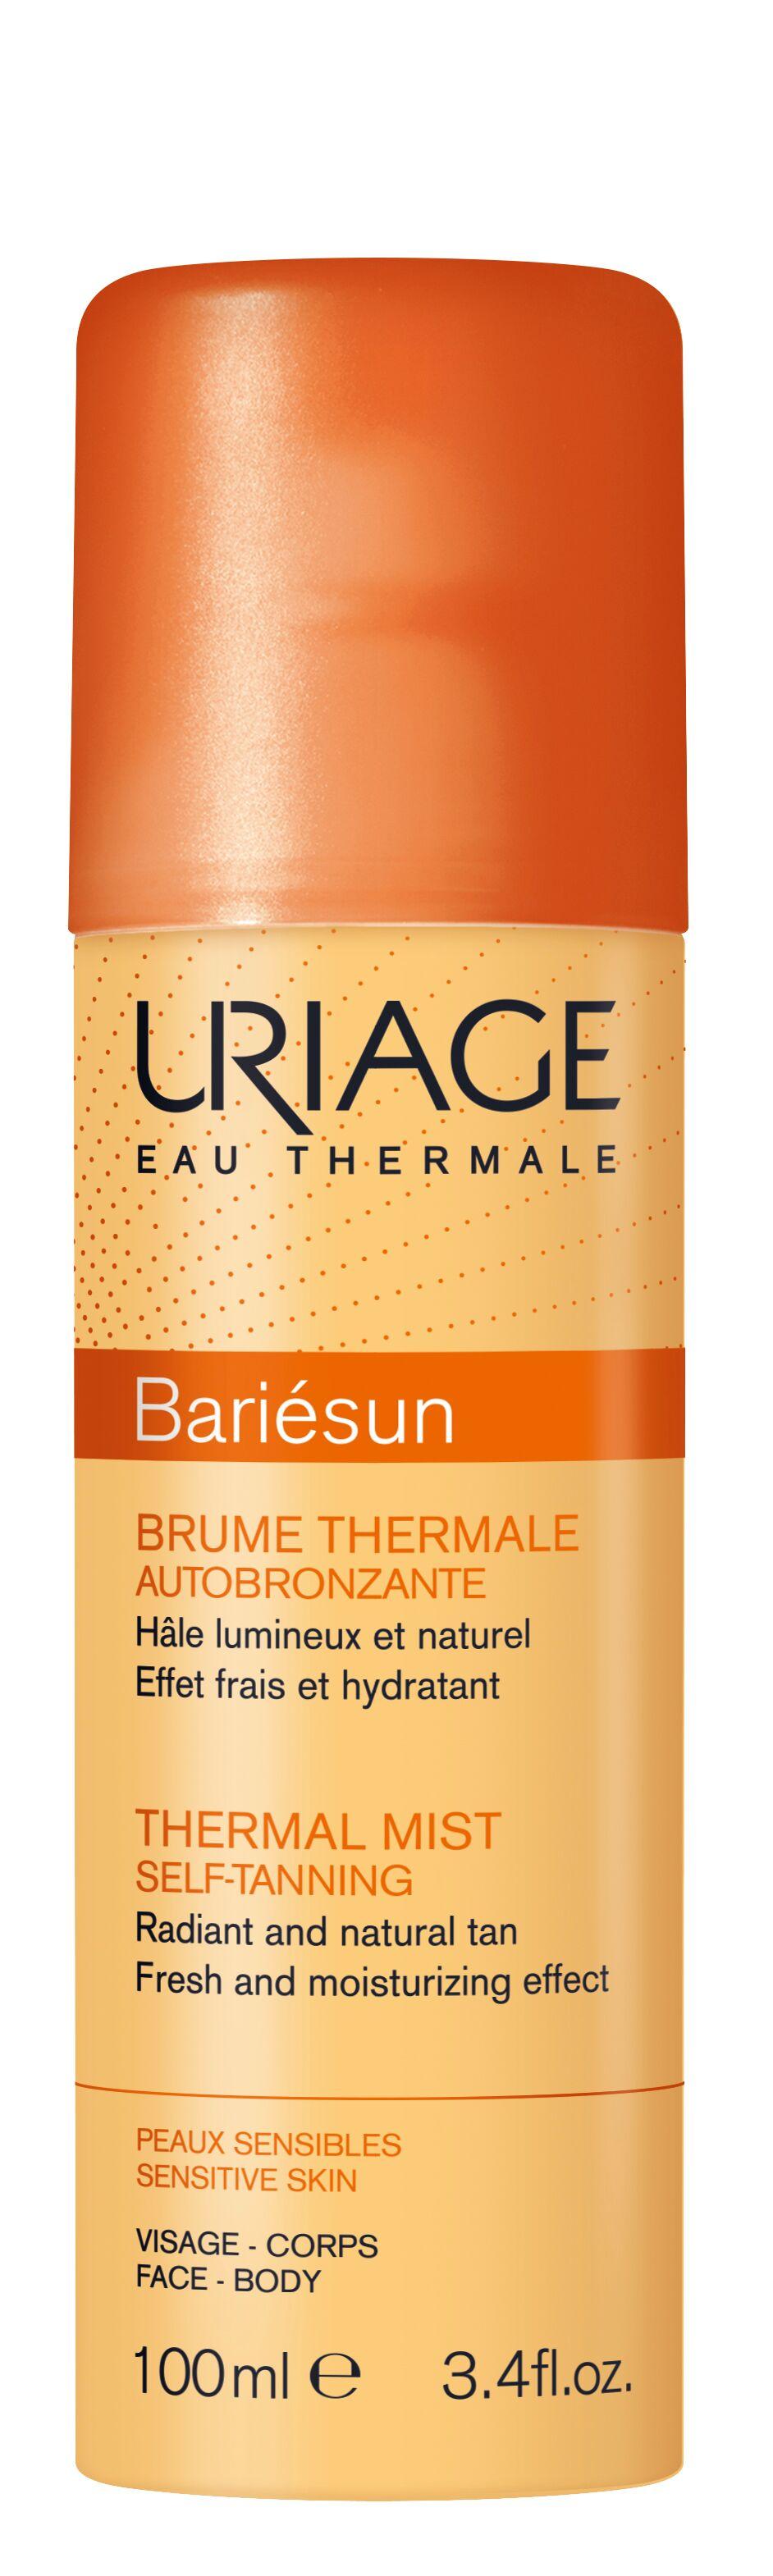 Brume Thermale Autobronzante Visage et Corps, Uriage, 12,45 €